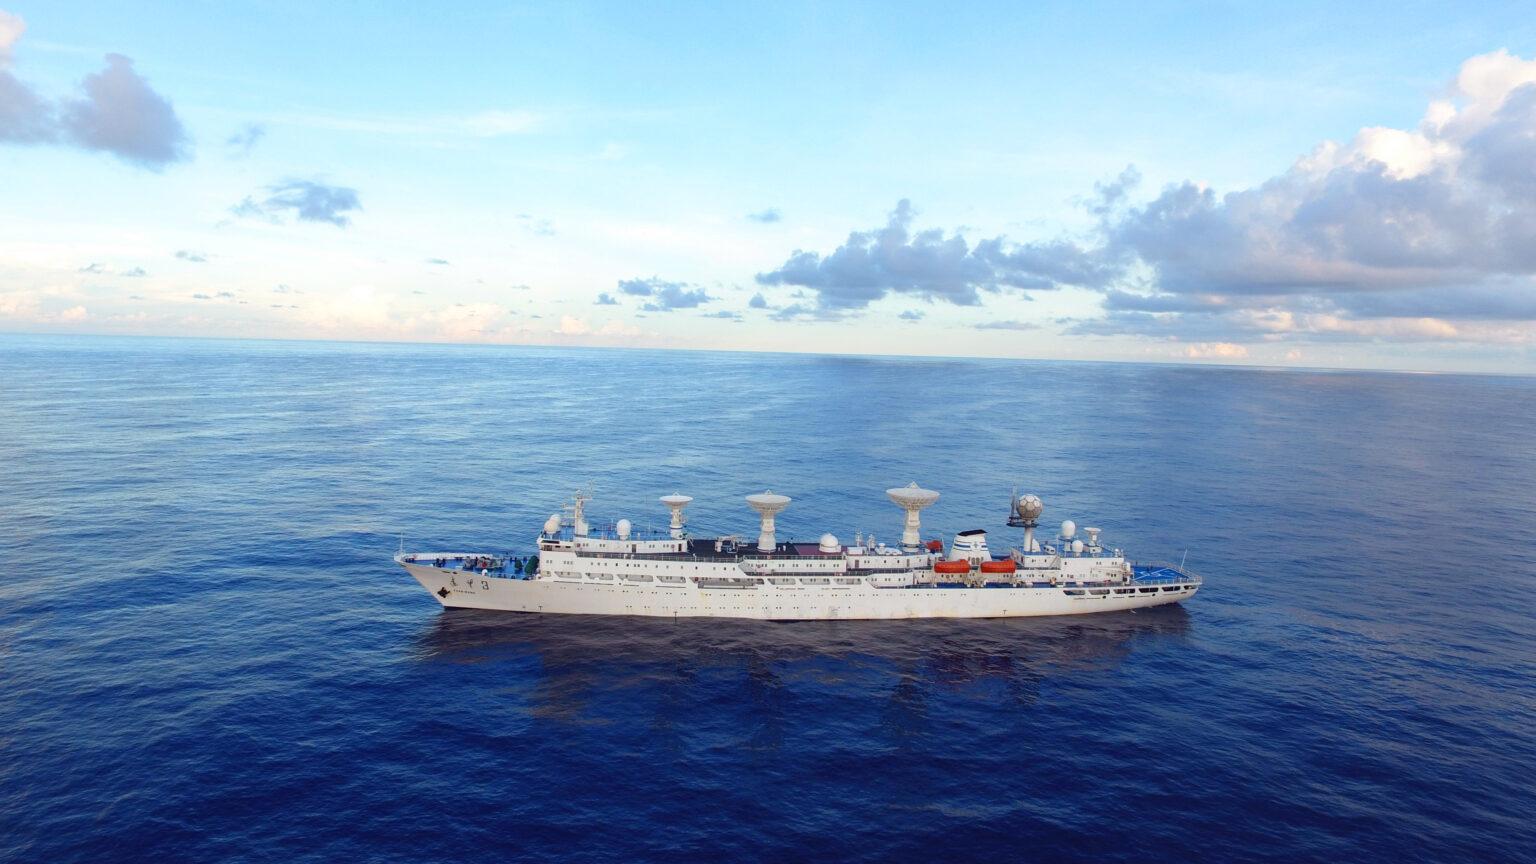 Yuanwang-3 communication vessel